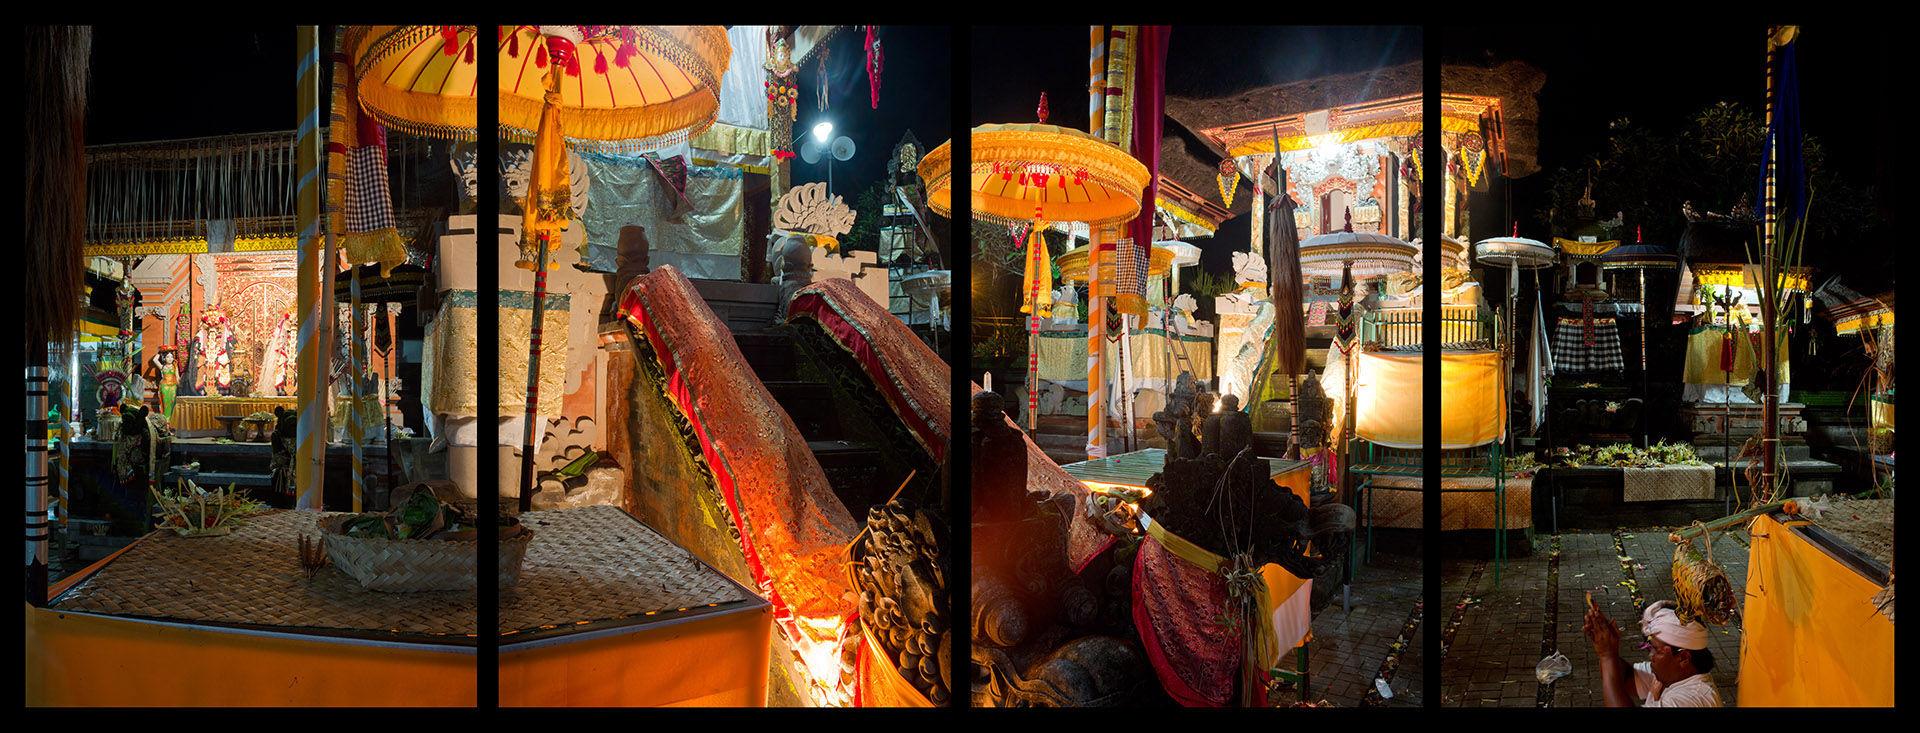 Bali Penestanan 4x #1